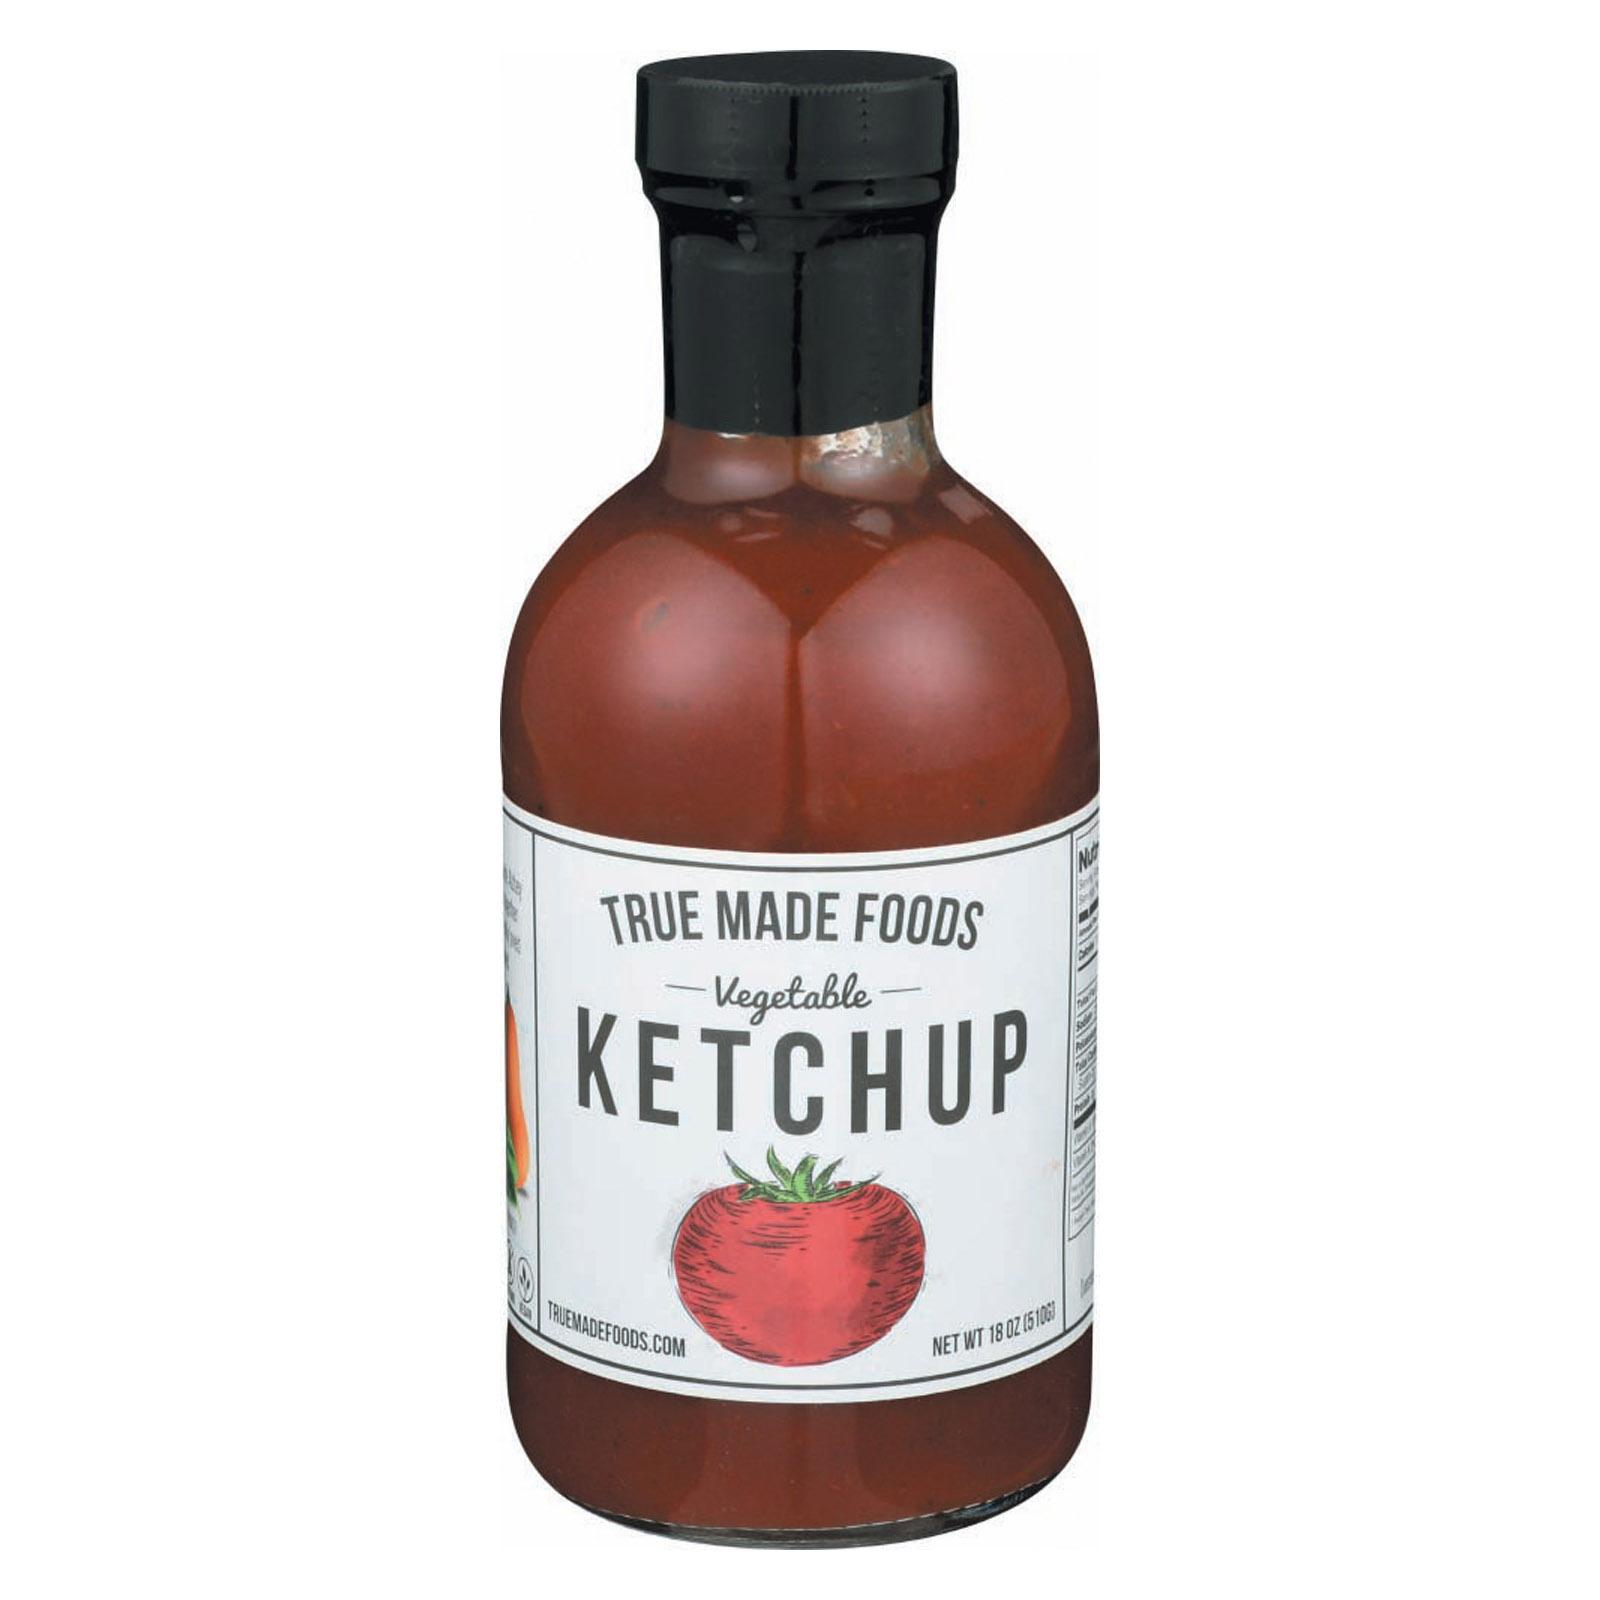 True Made Foods Ketchup - Vegetable - Case of 6 - 18 oz